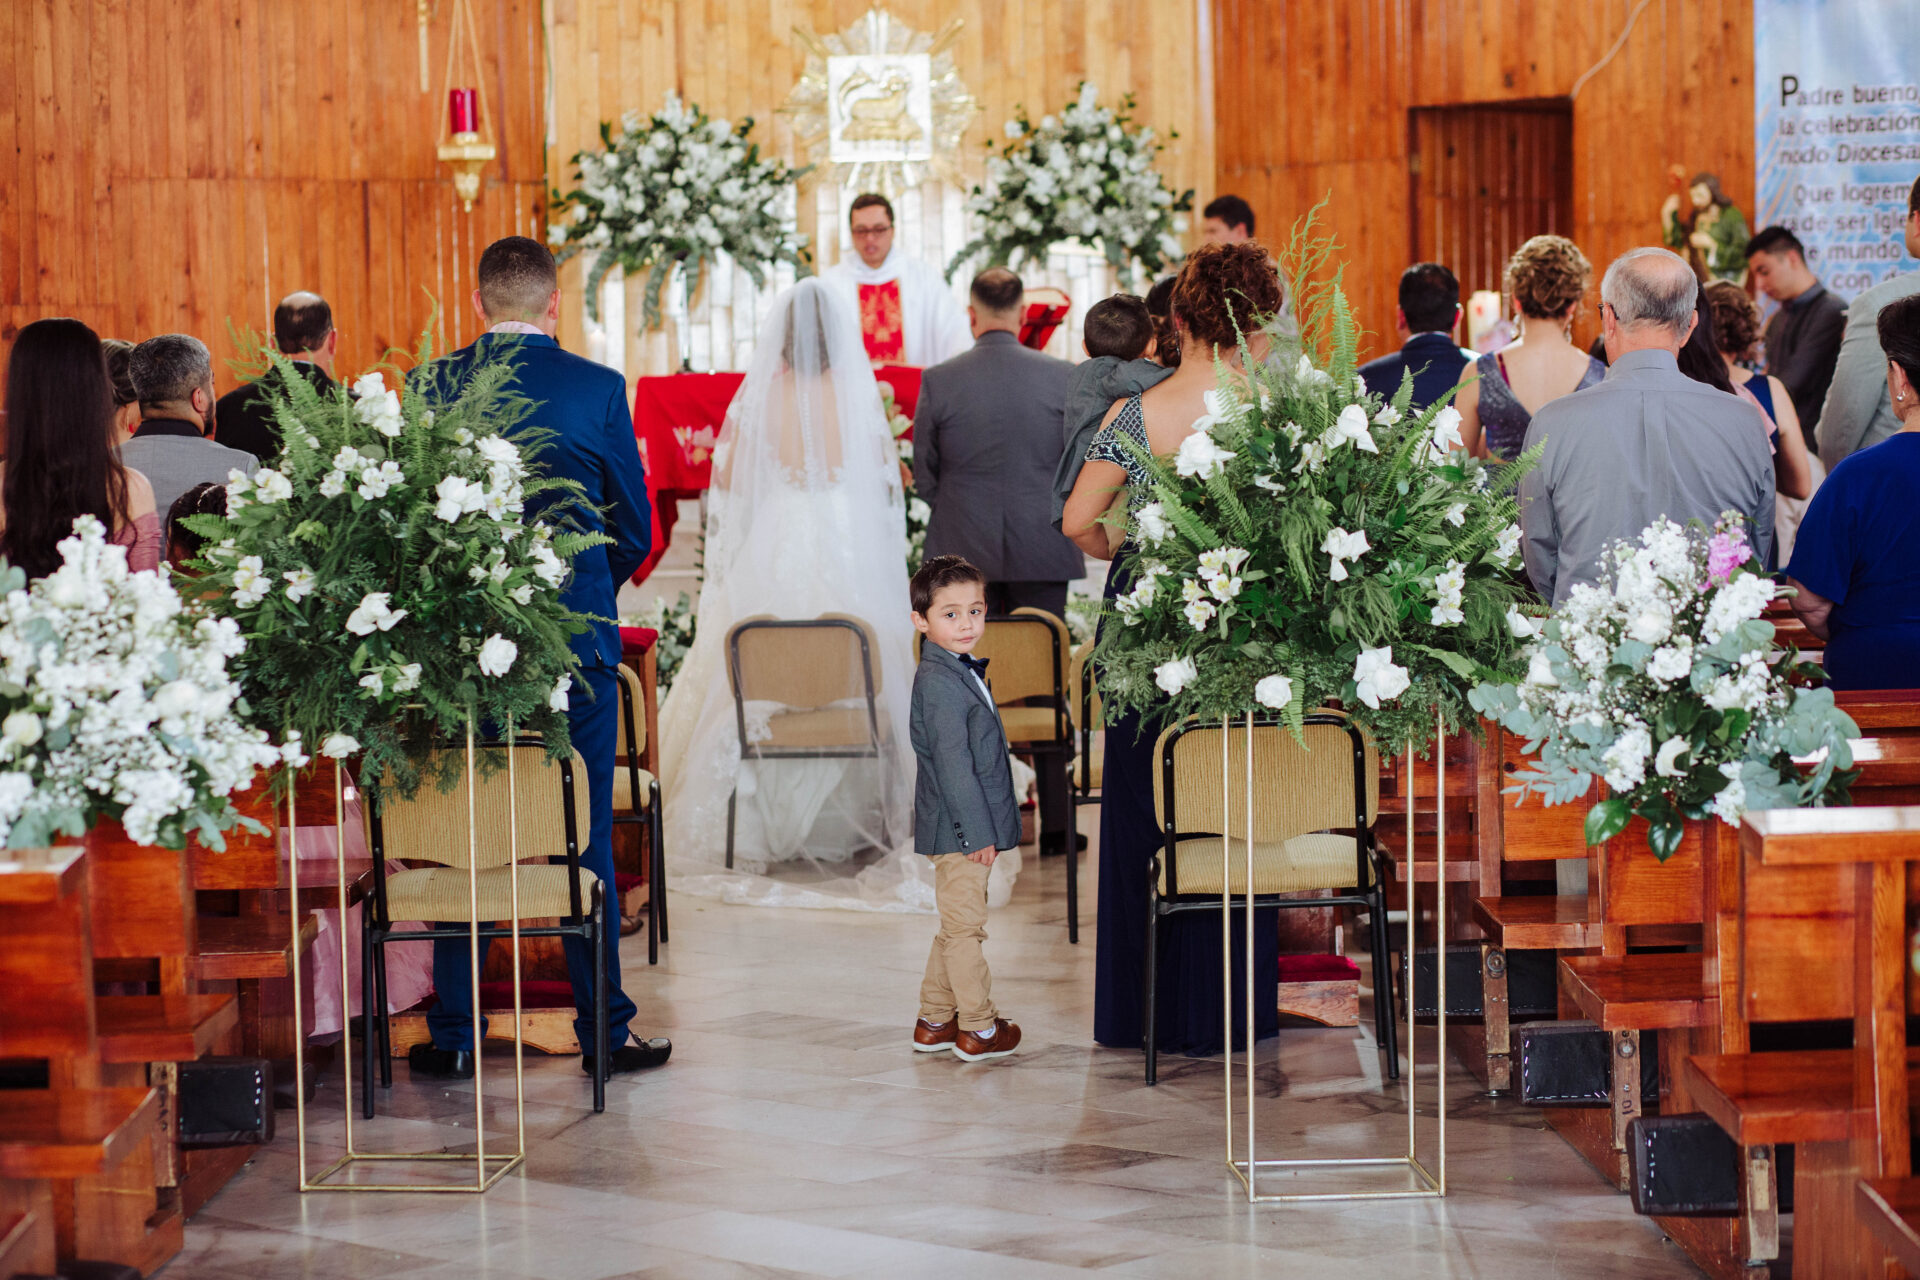 javier_noriega_fotografo_bodas_zacatecas_fresnillo_chihuahua_wedding_photographer6